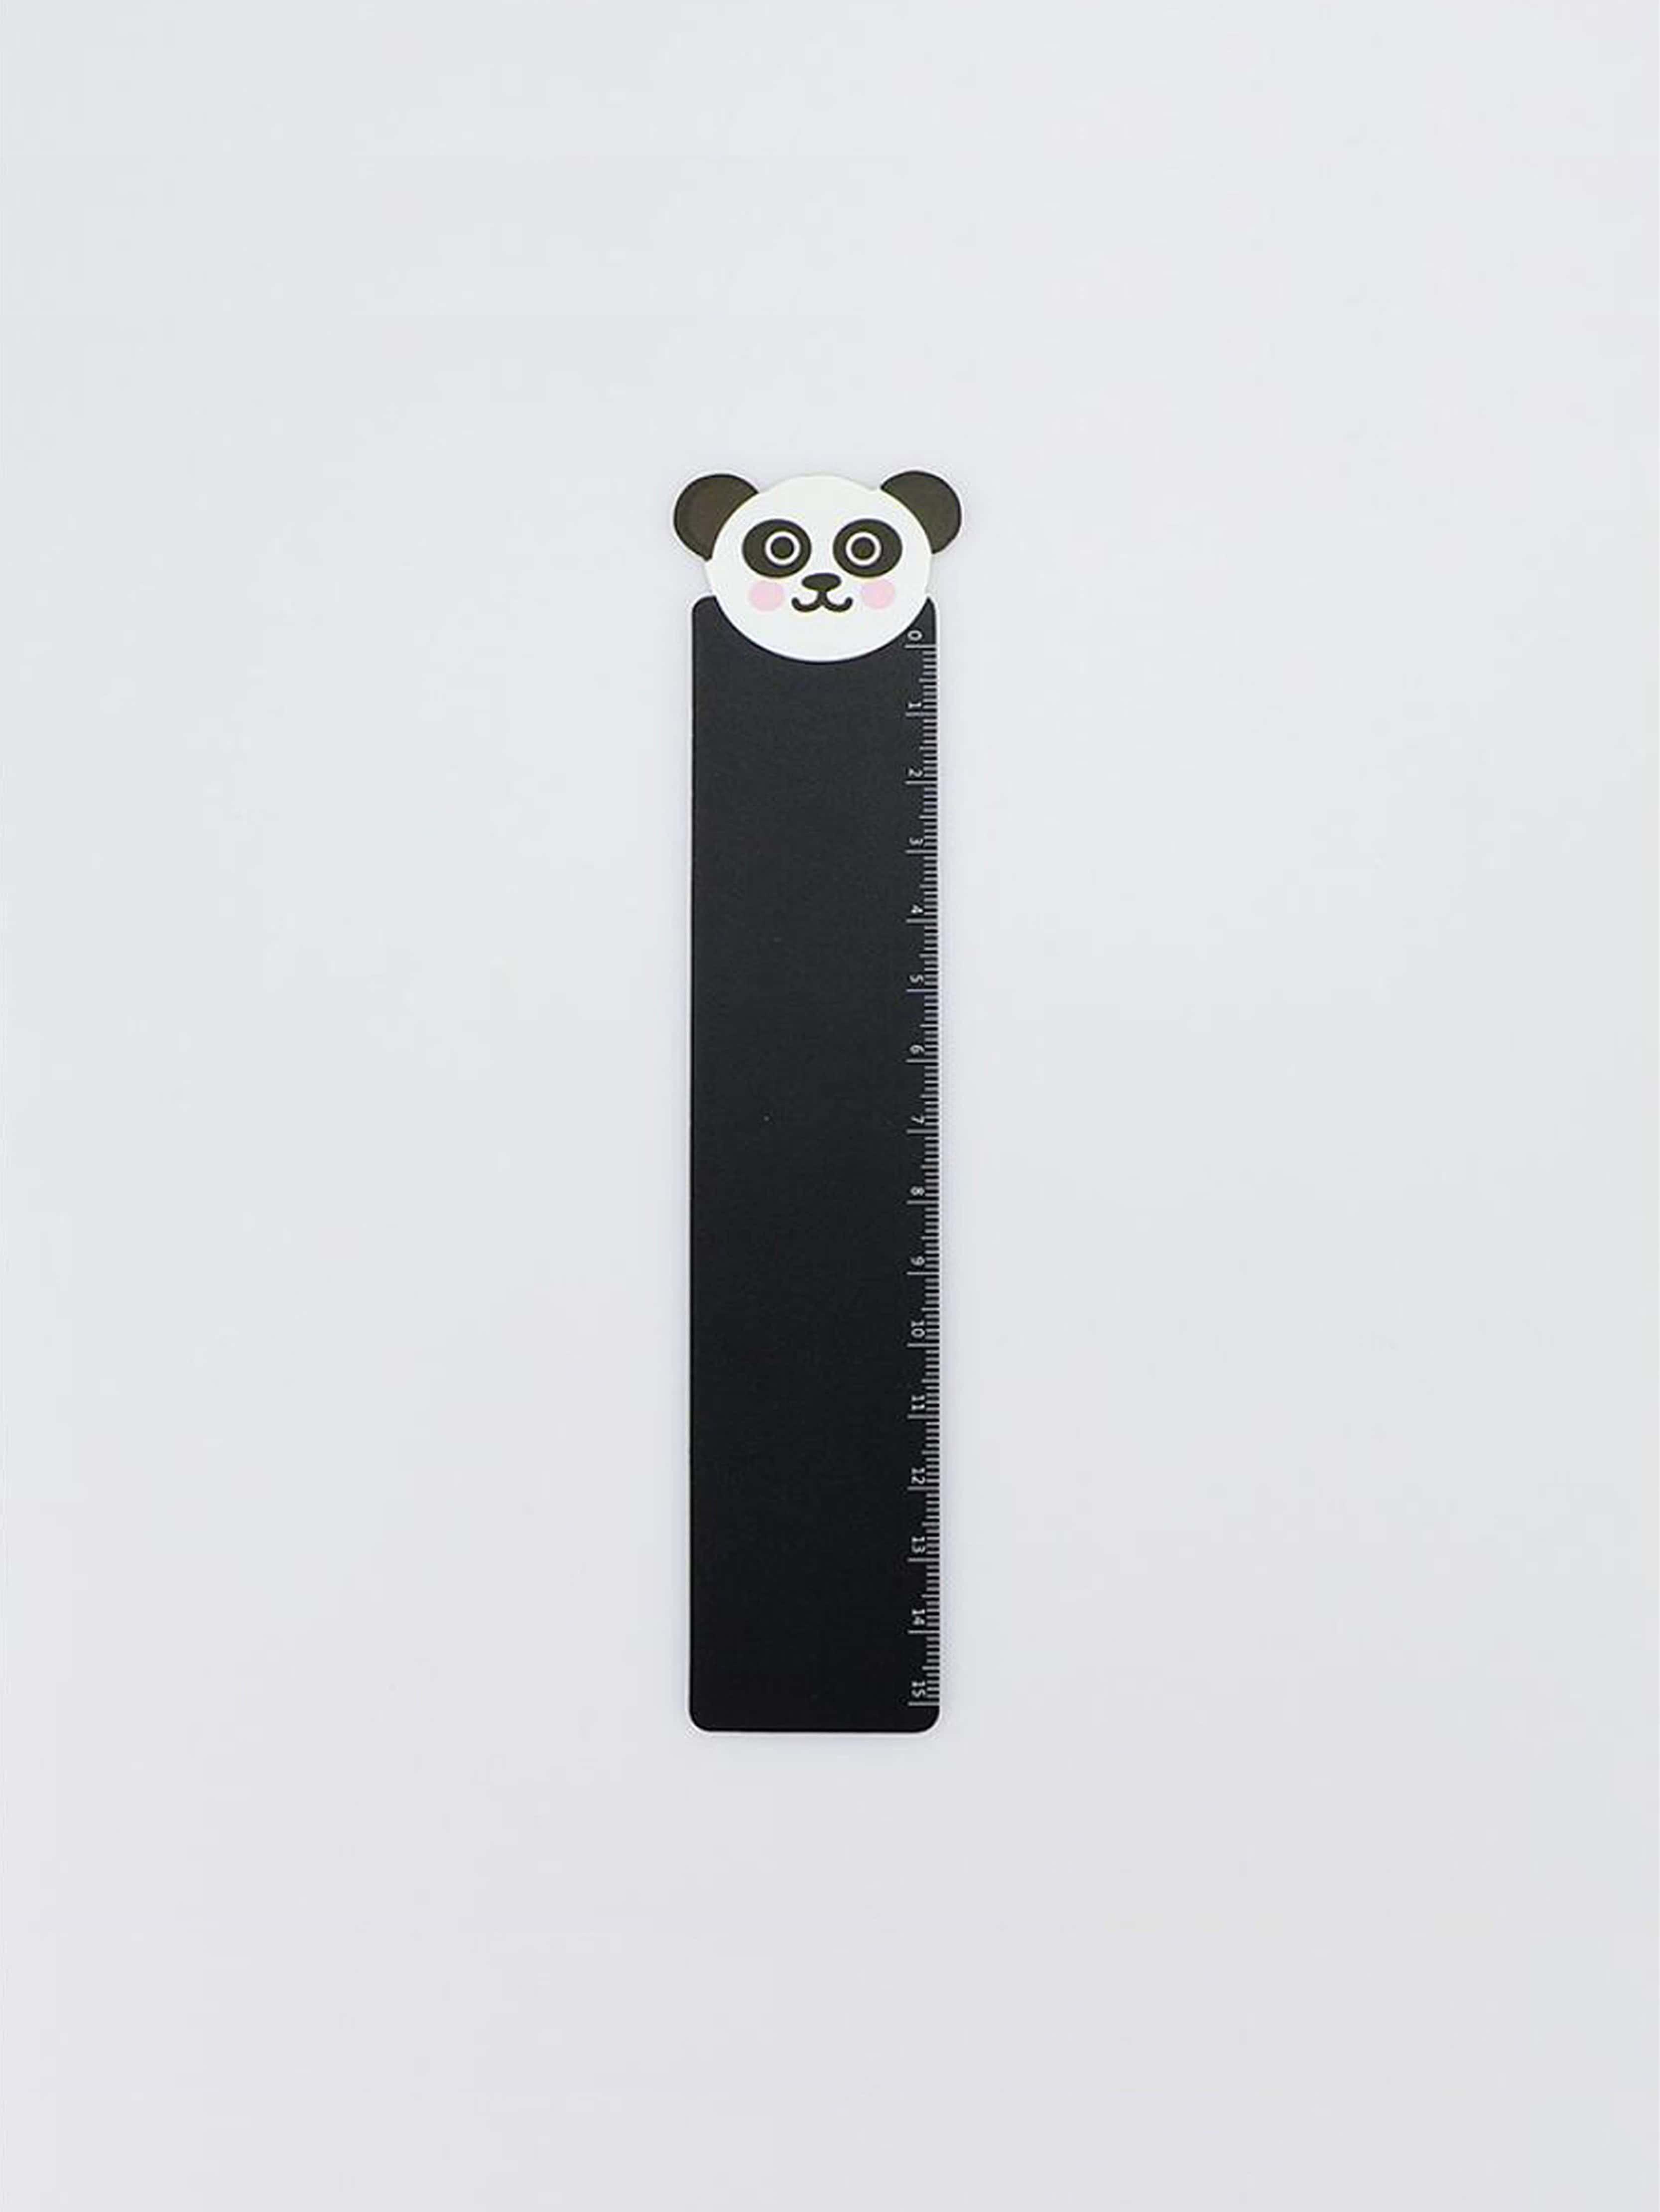 Panda Ruler 15cm аксессуар комплект кабелей rockdale 15cm ic016 15cm